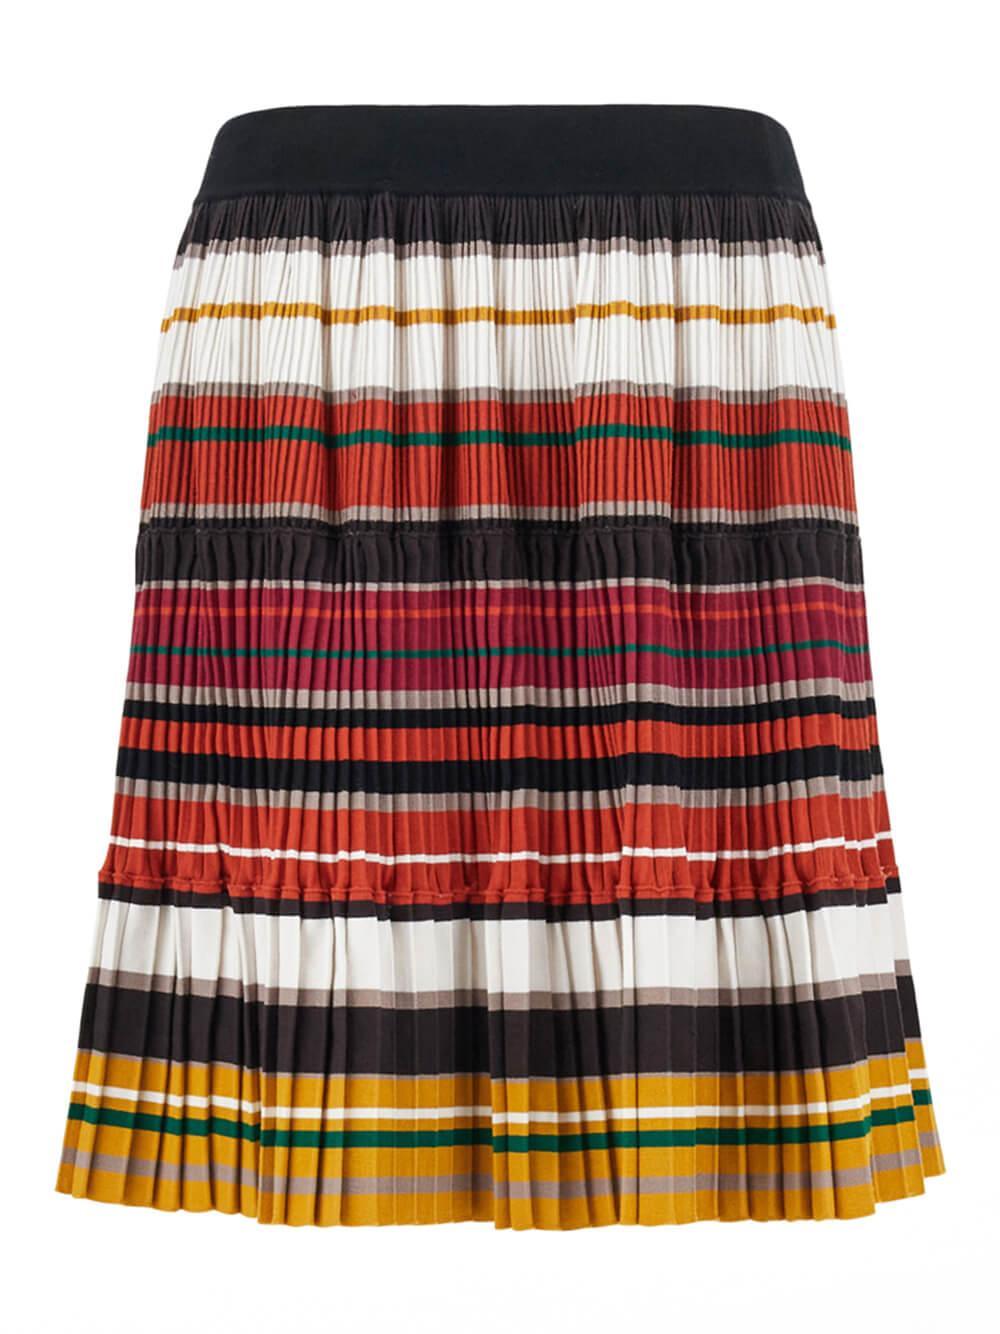 Europa Stretch Stripe Skirt Item # 5306011306